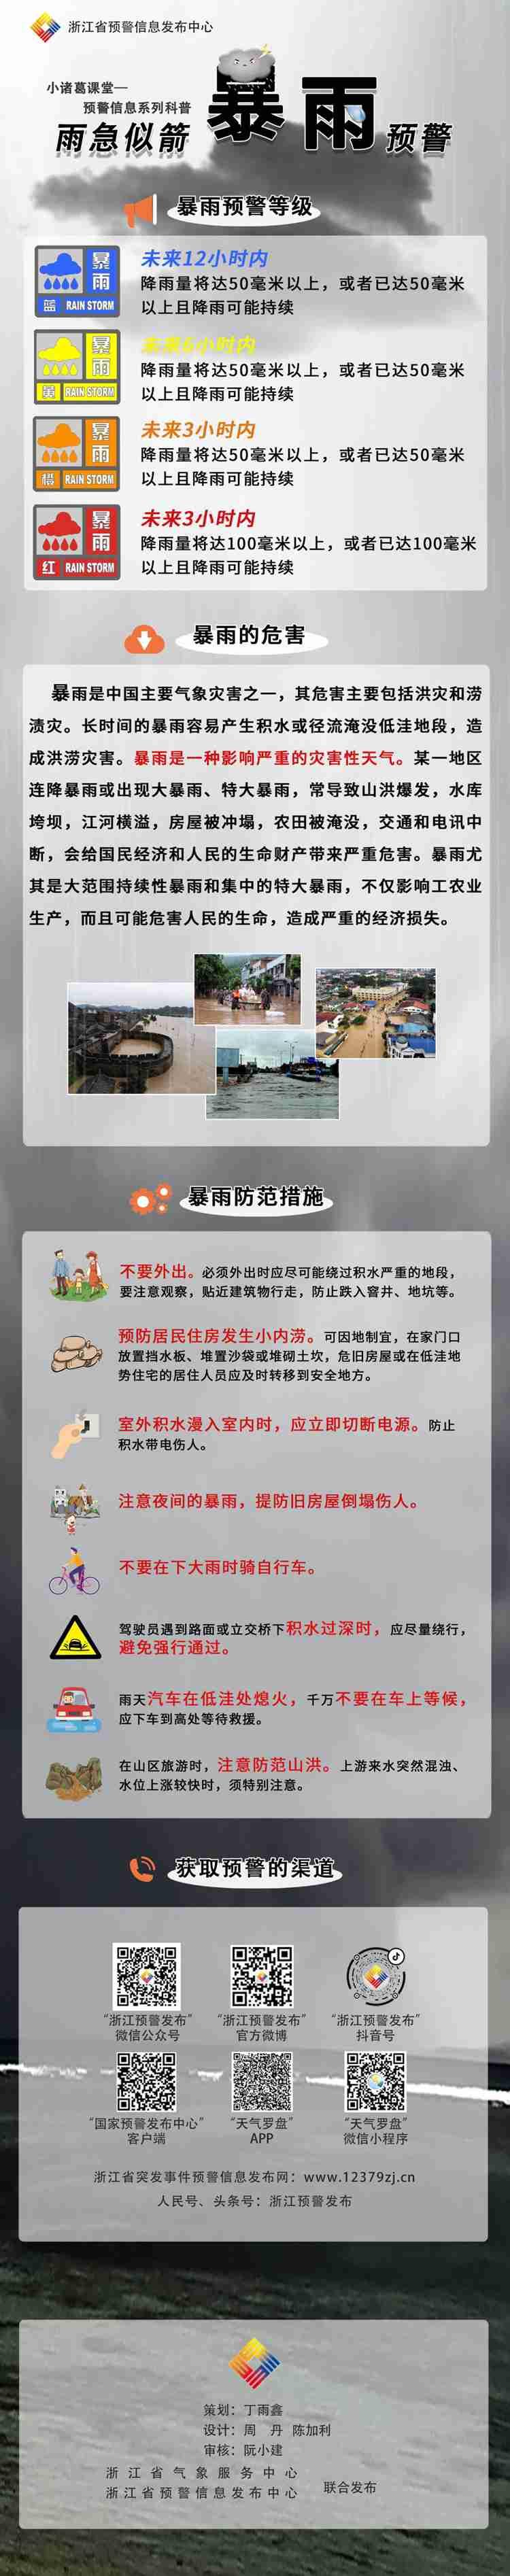 http://i.weather.com.cn/images/zhejiang1/rdzt/2021/05/19/1621389524428087458.jpg